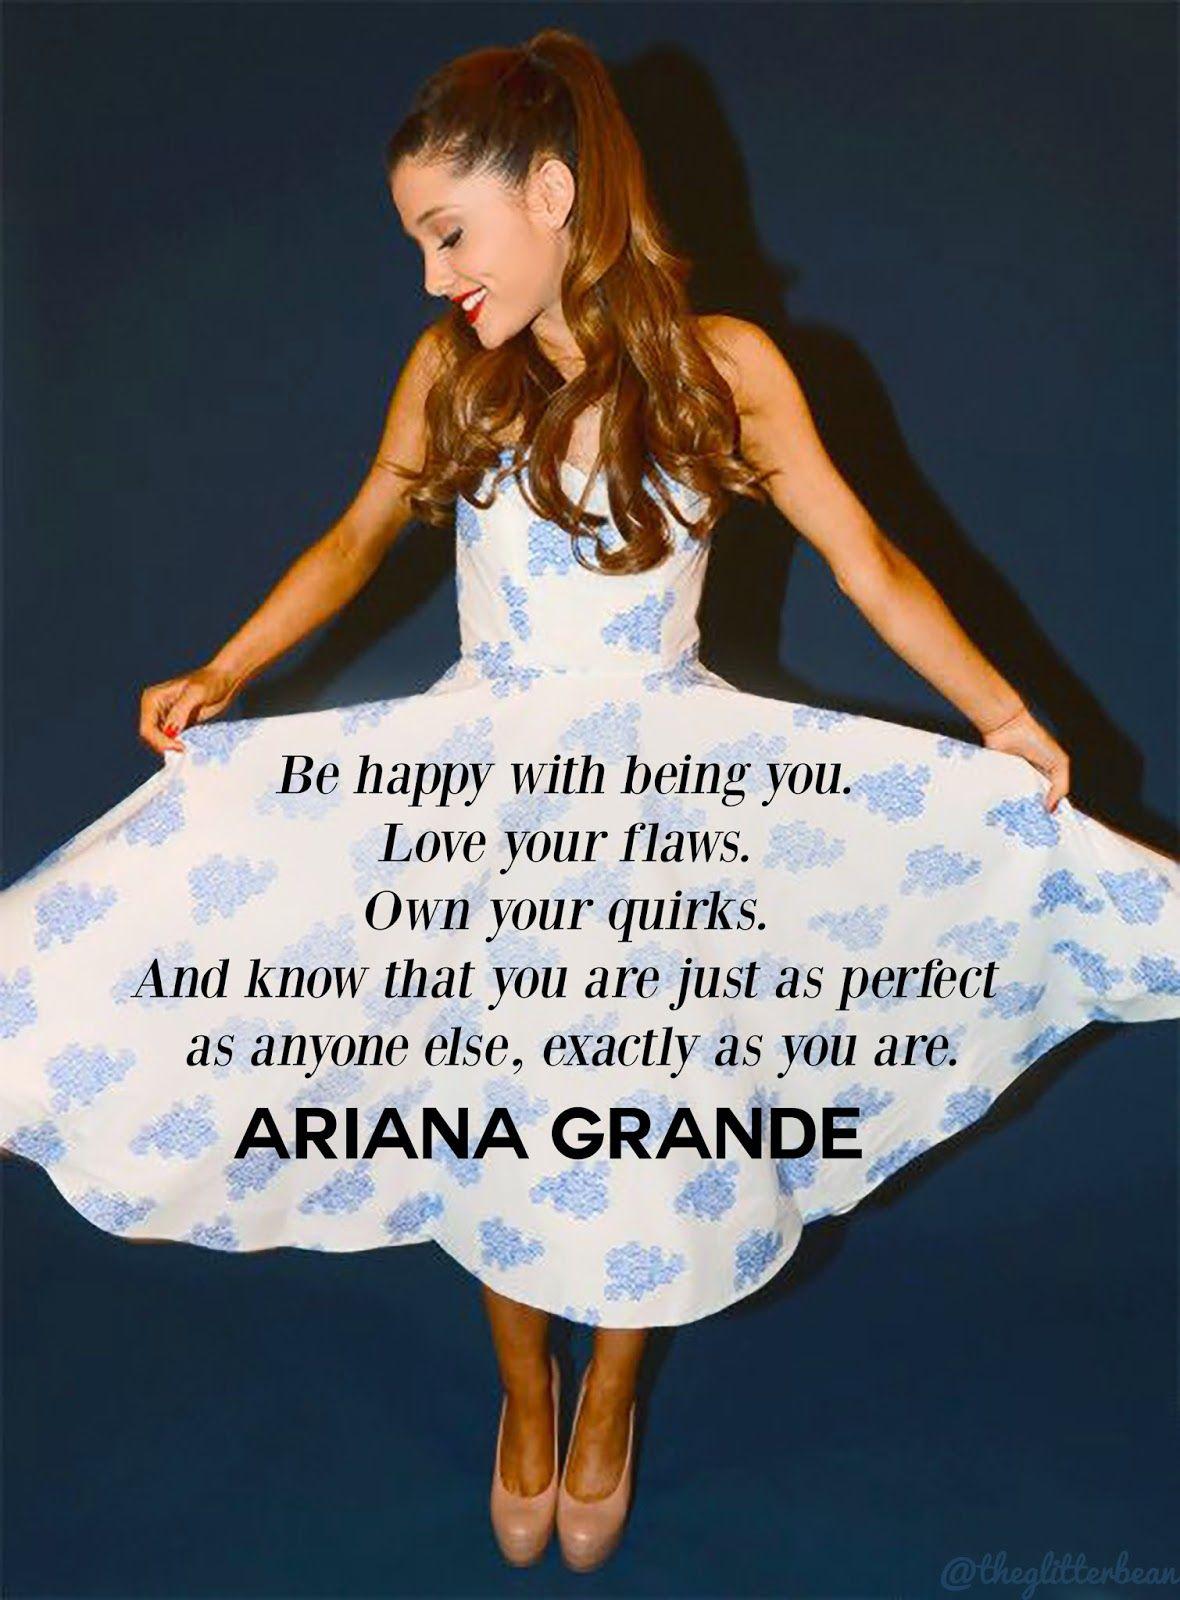 Ariana Grande quote | Ariana grande | Pinterest | Ariana ...